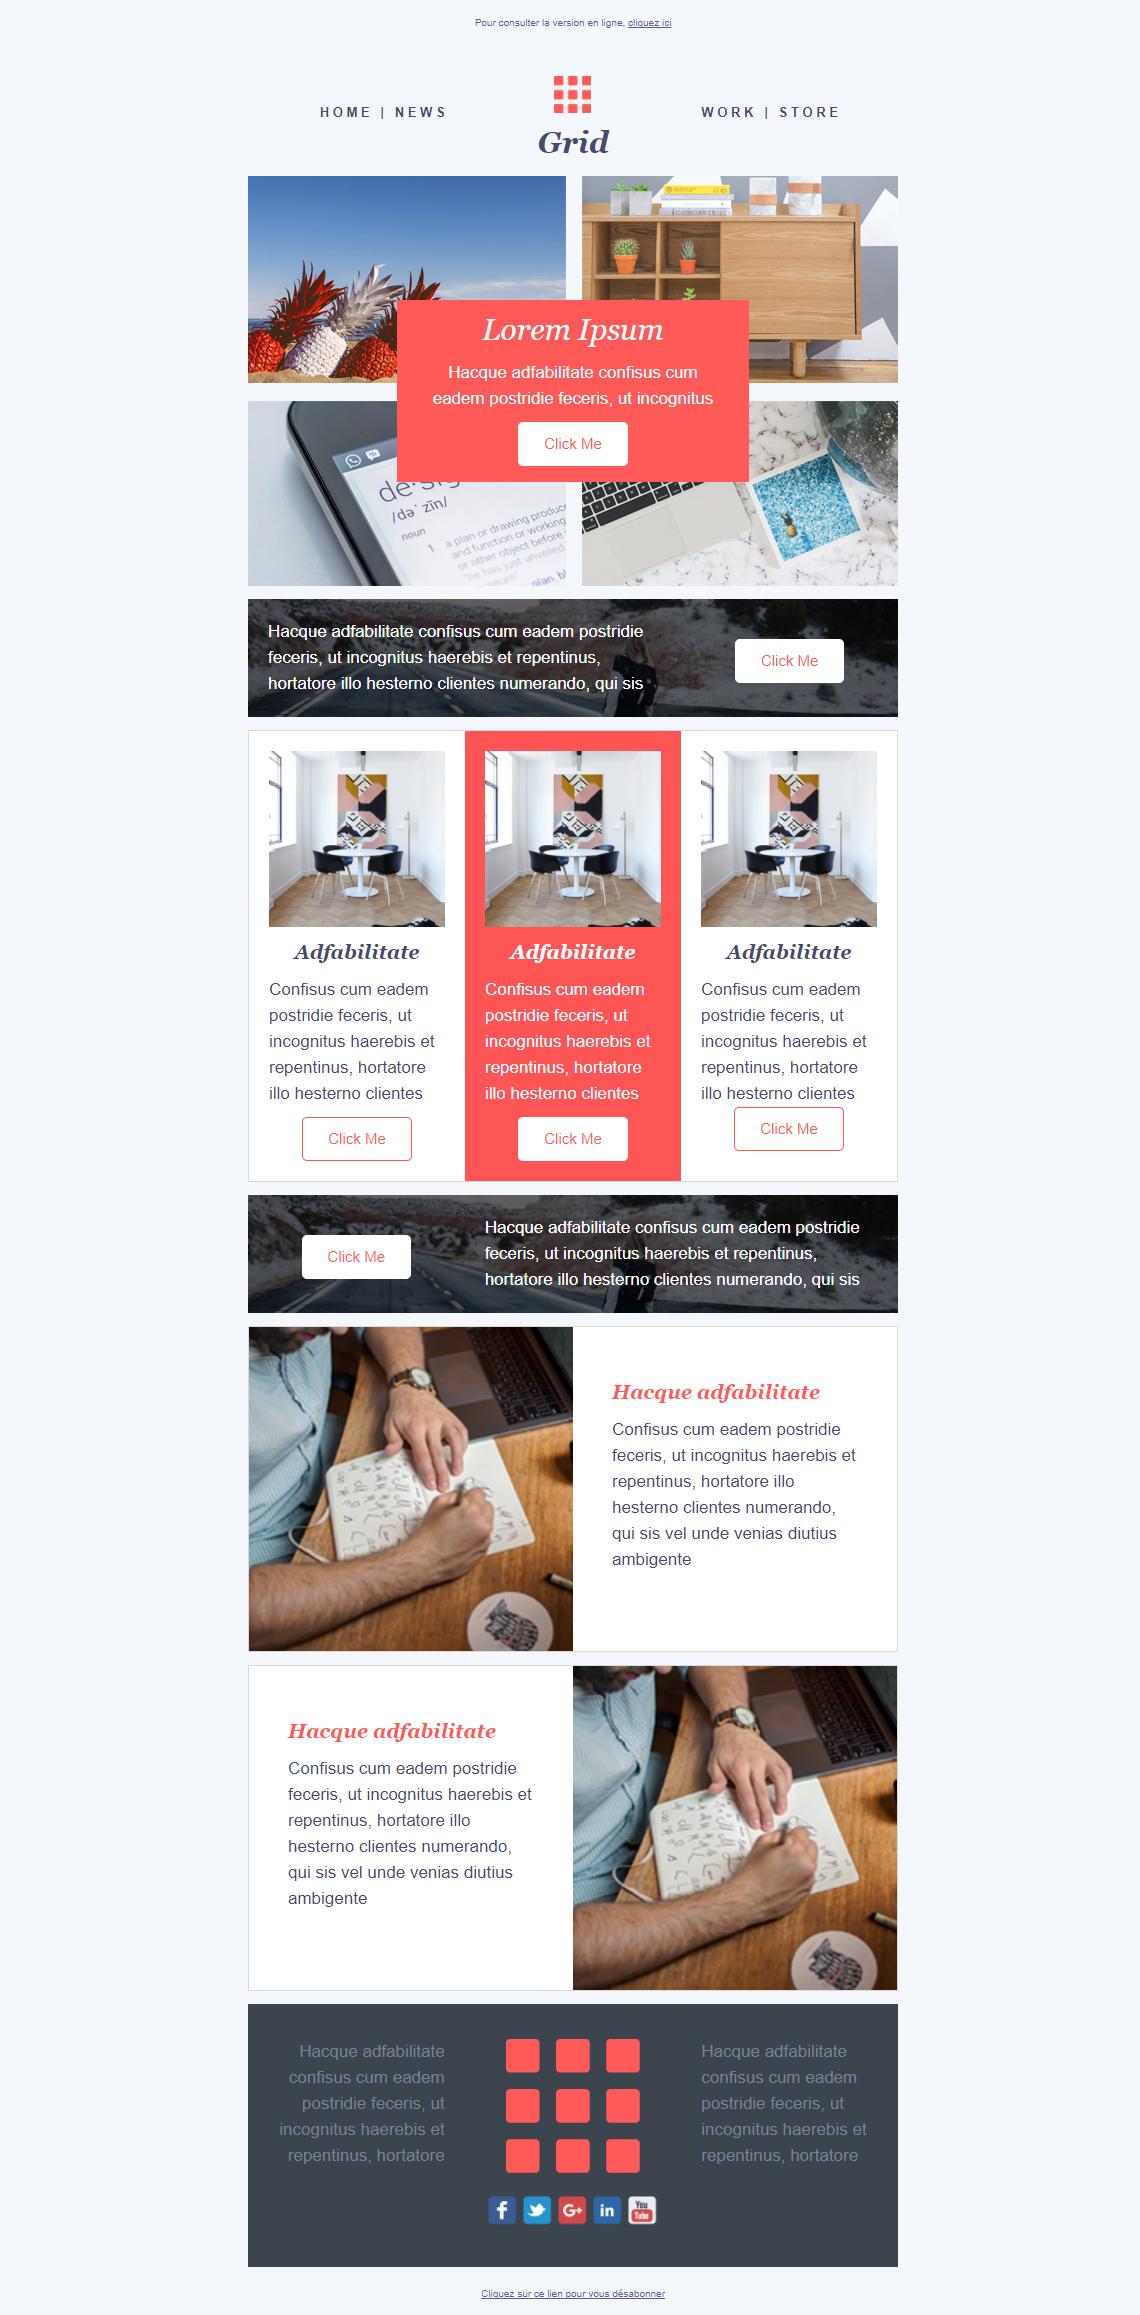 Templates Emailing Grid Sarbacane